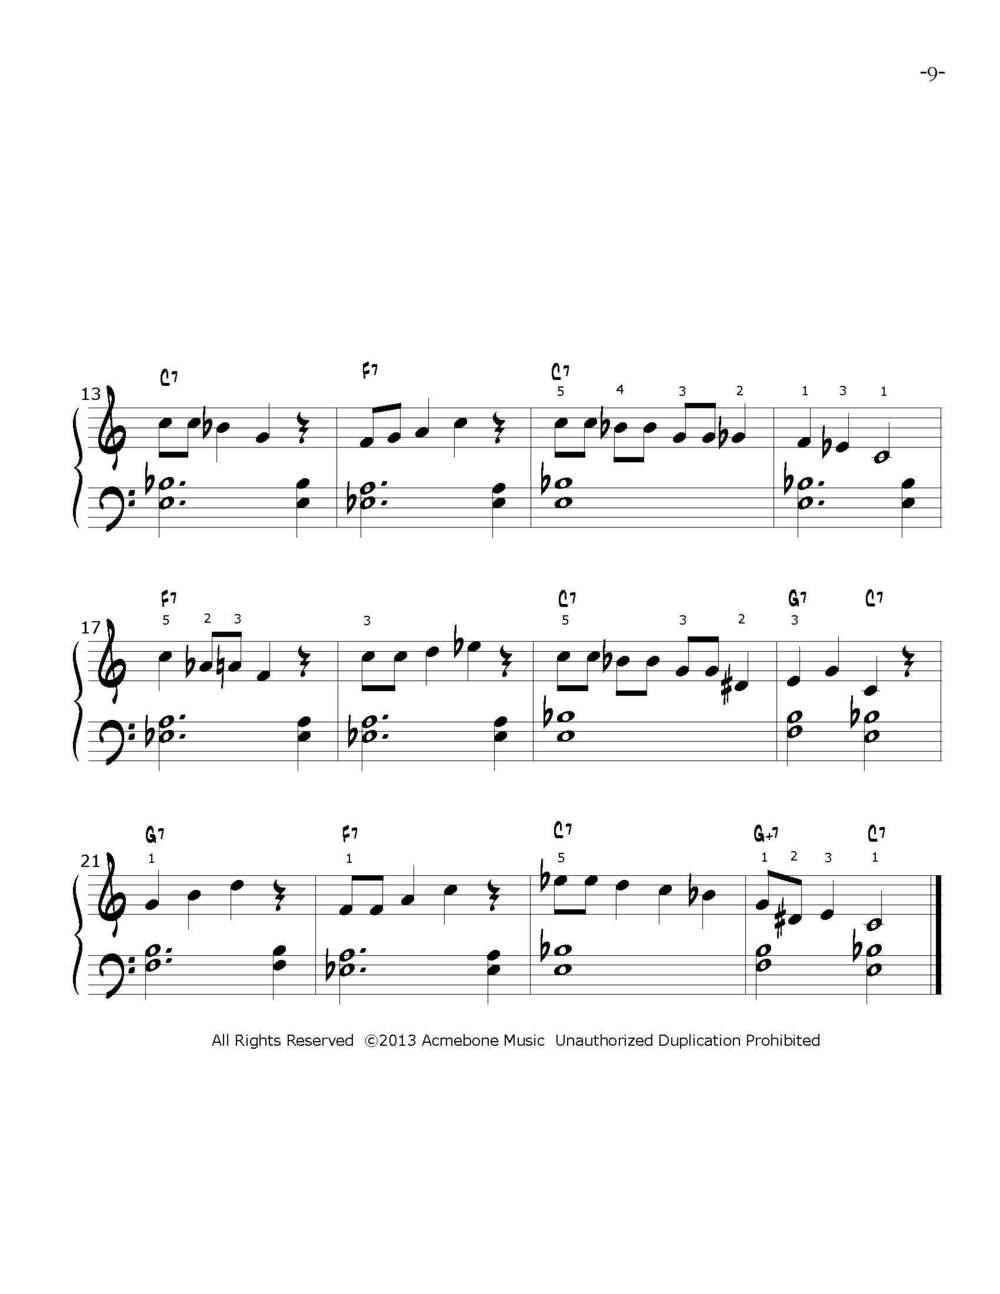 Progressive Jazz Etudes for Piano bk1 for web_Page_10.jpg